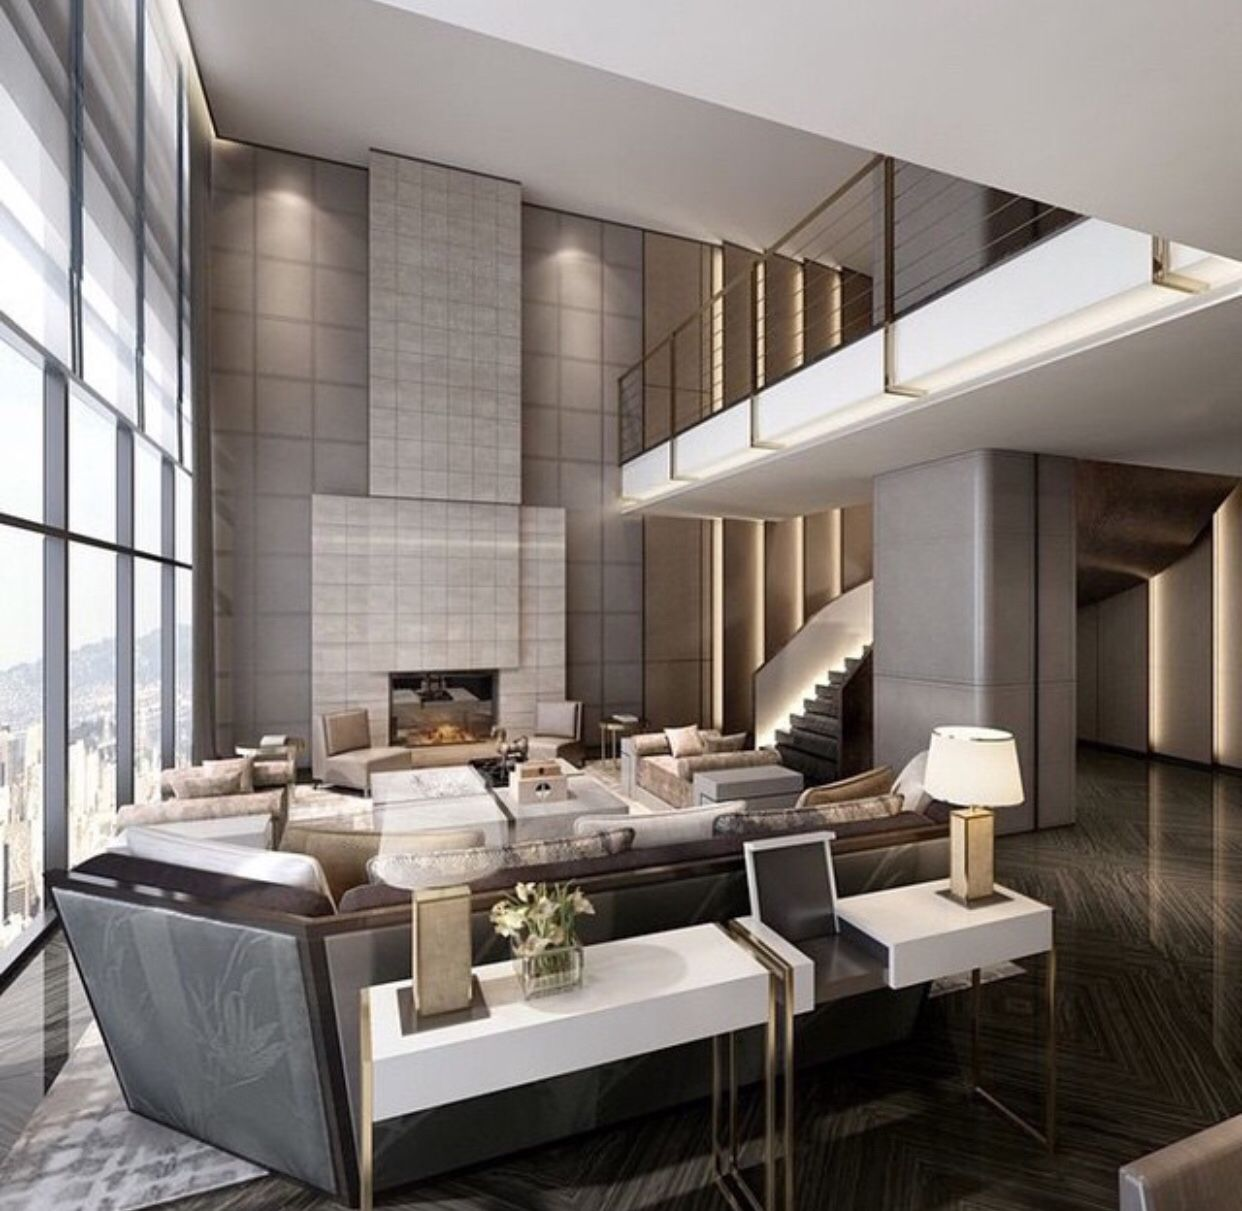 High ceiling  Design  Pinterest  Ceilings Living rooms